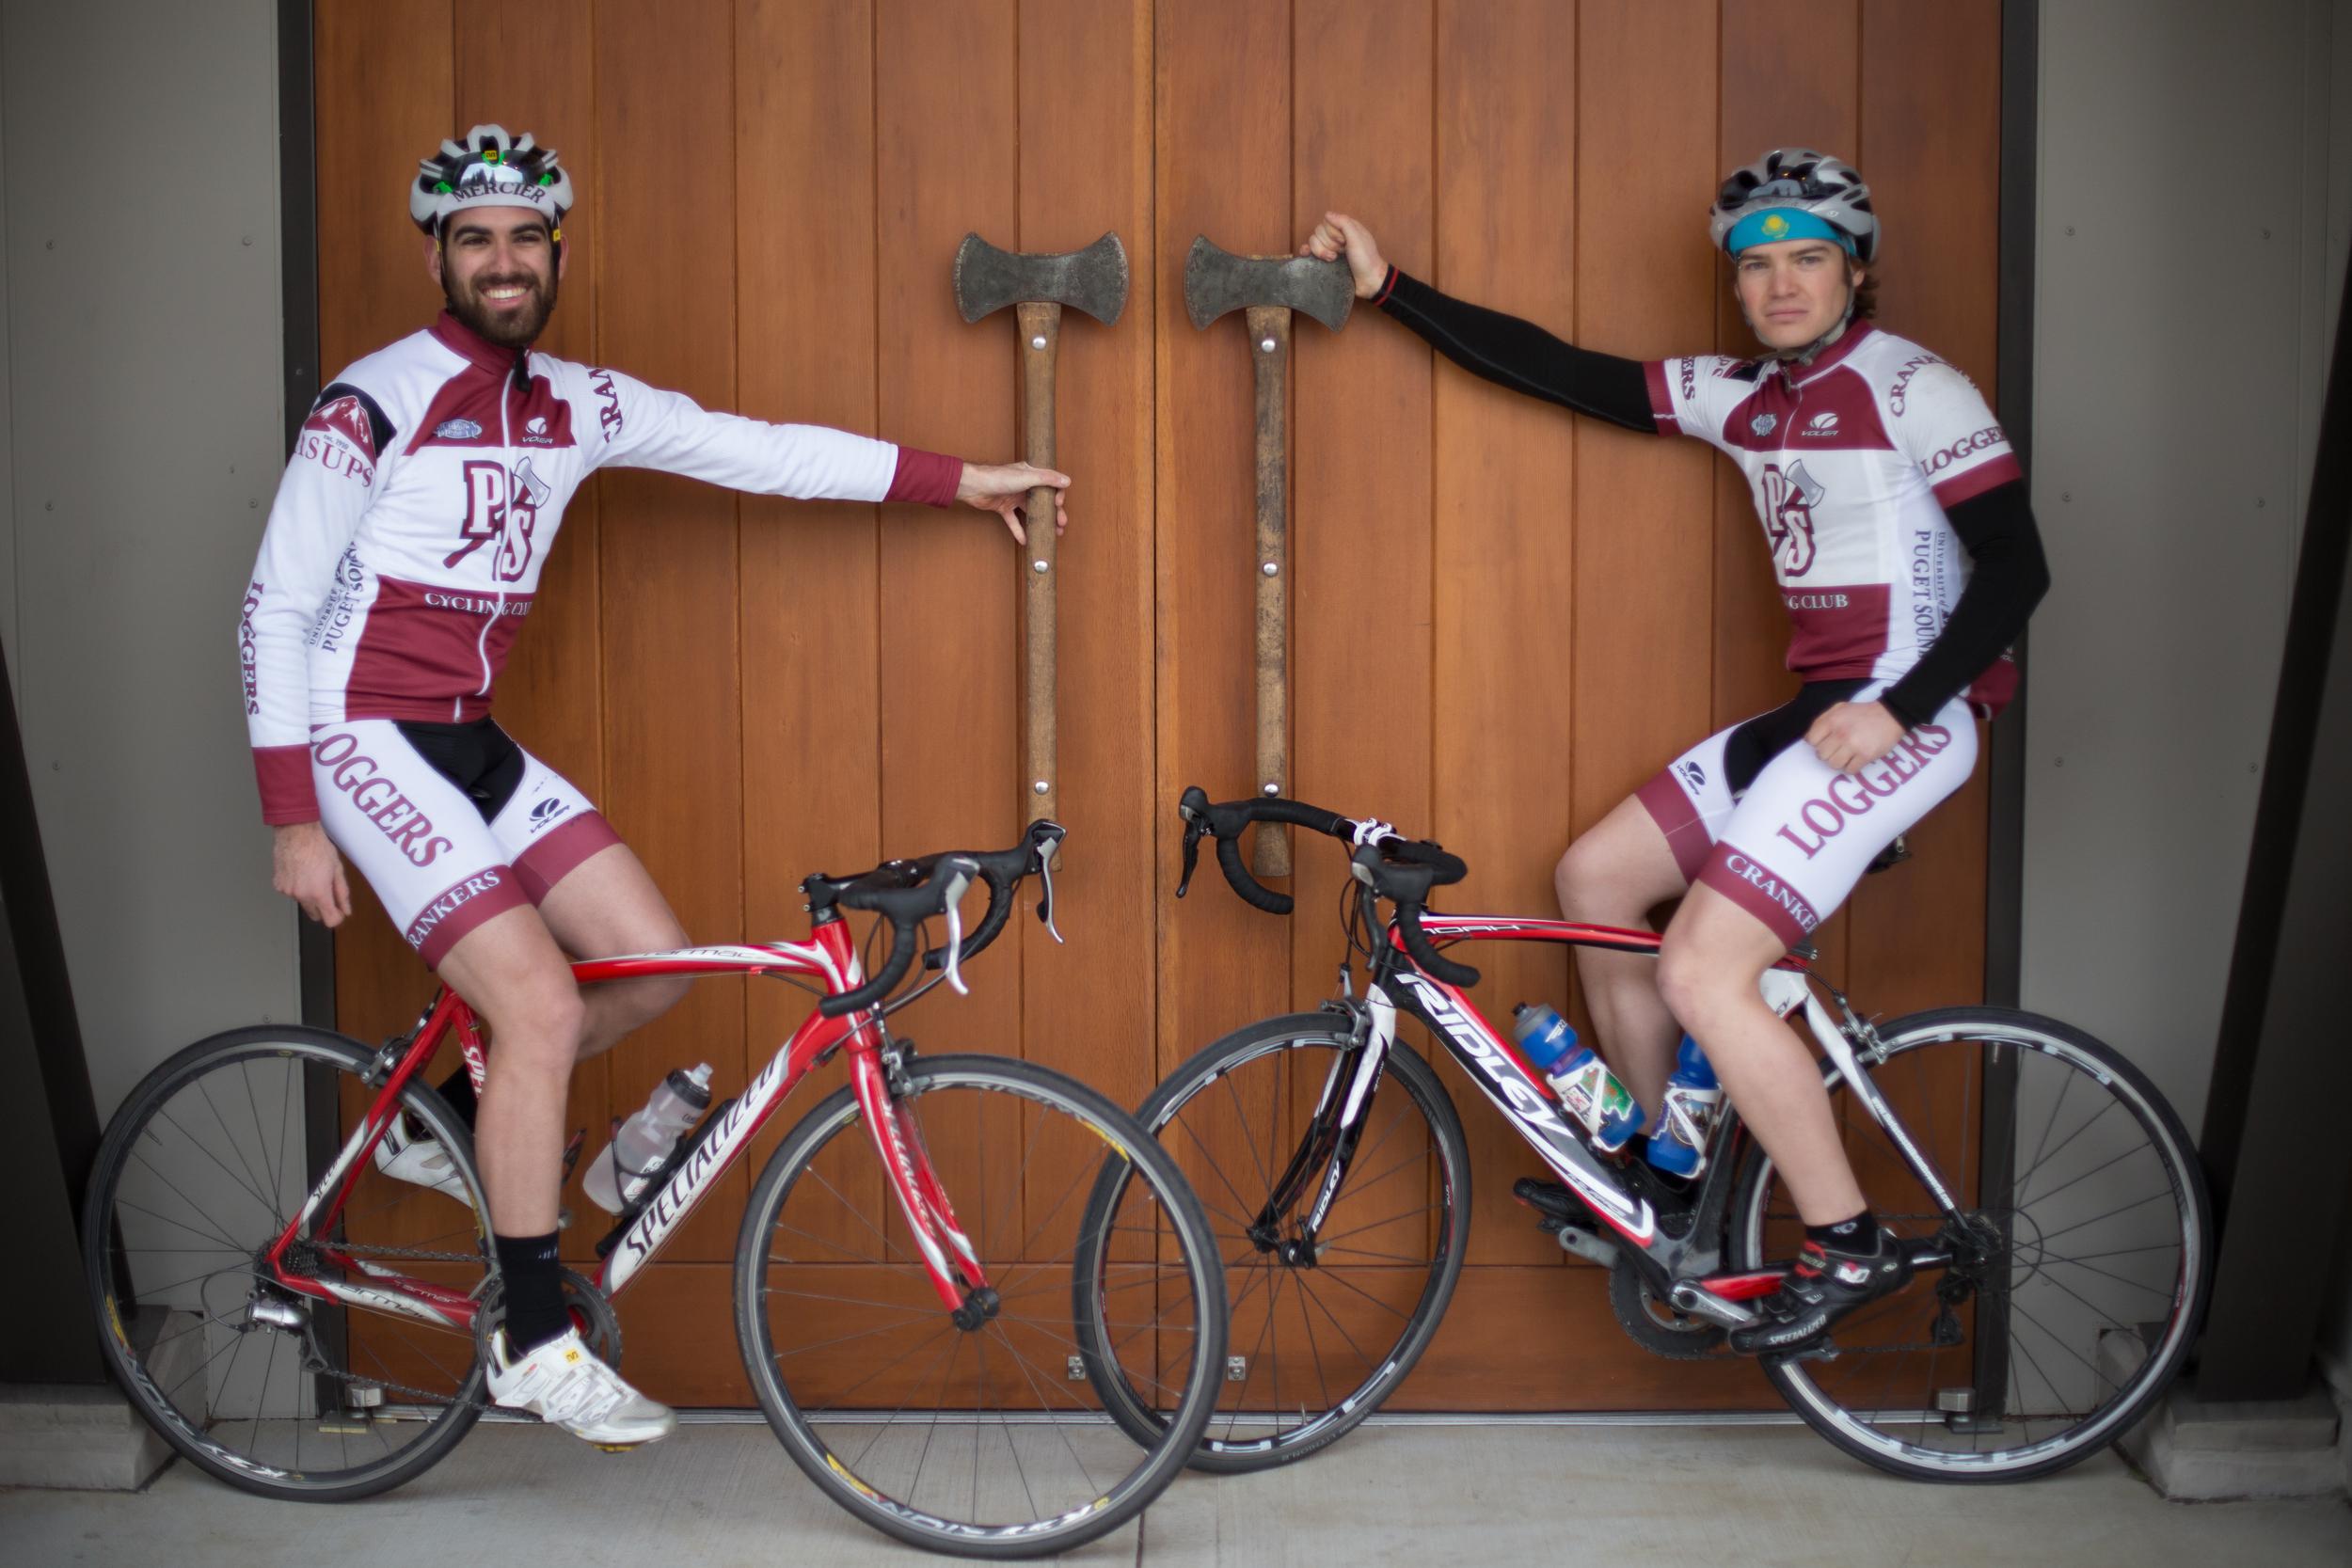 Puget Sound Cycling Club